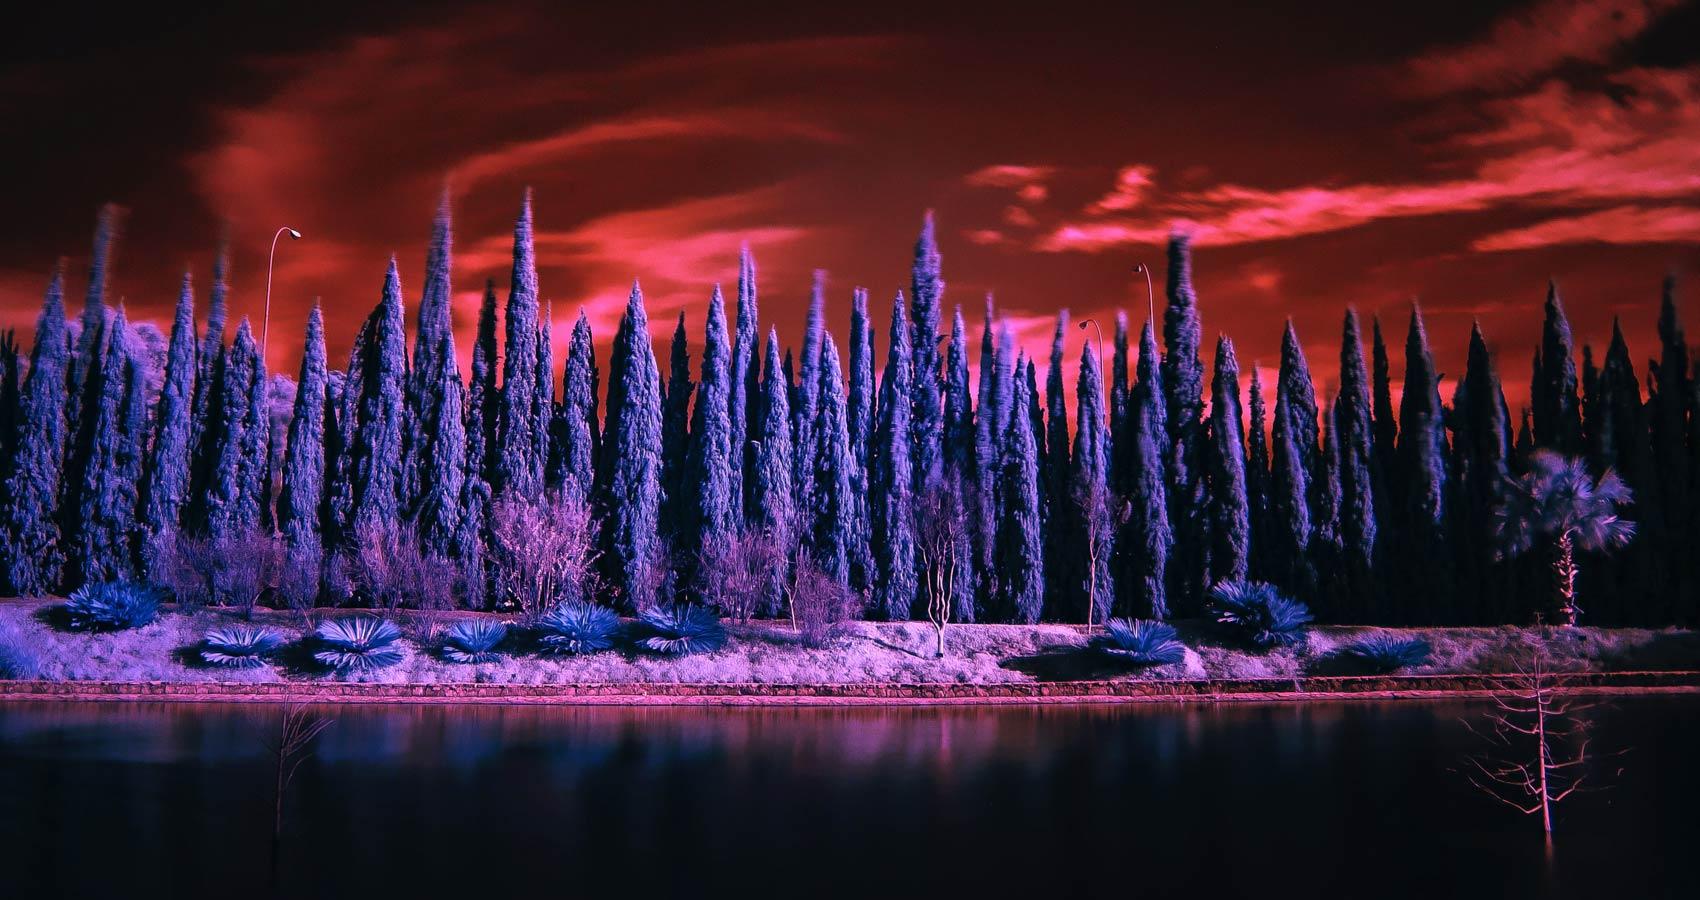 The Land of Poets, a haibun by Pragya Singh at Spillwords.com